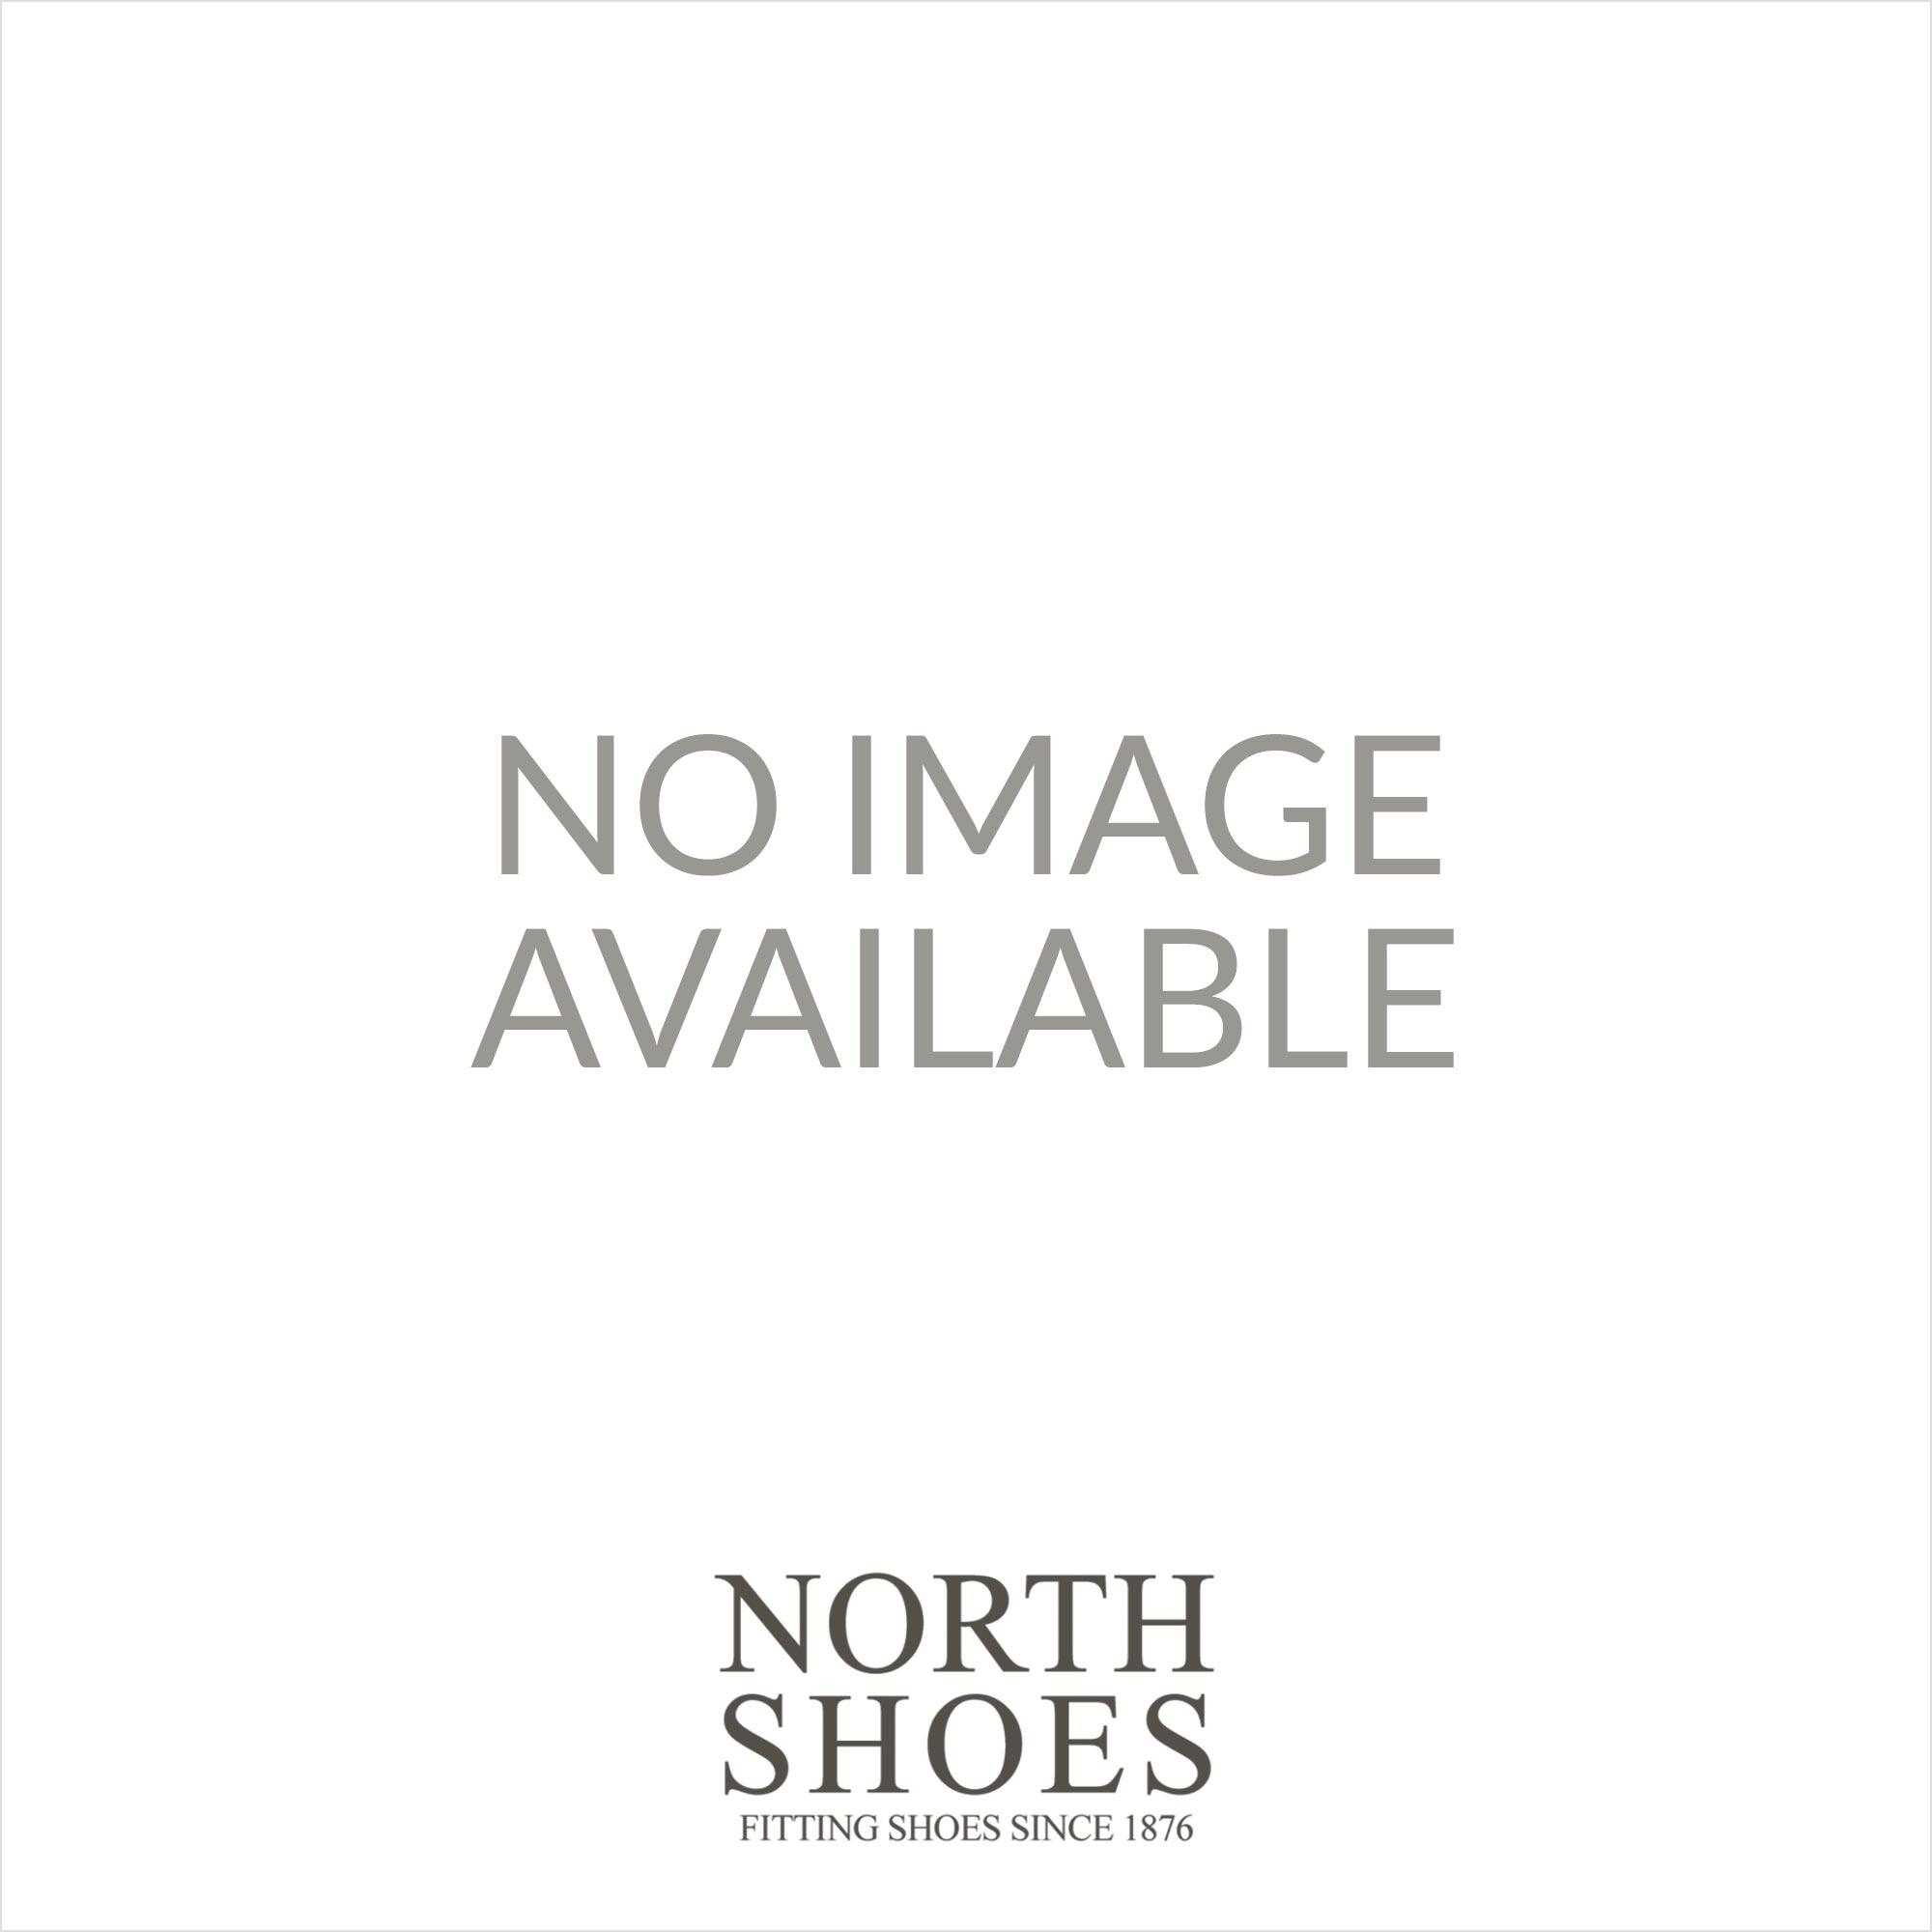 fe46cd65028b ... Clarks Un Reisel Mara Pewter Metallic Leather Womens T Bar Strappy  Sandal